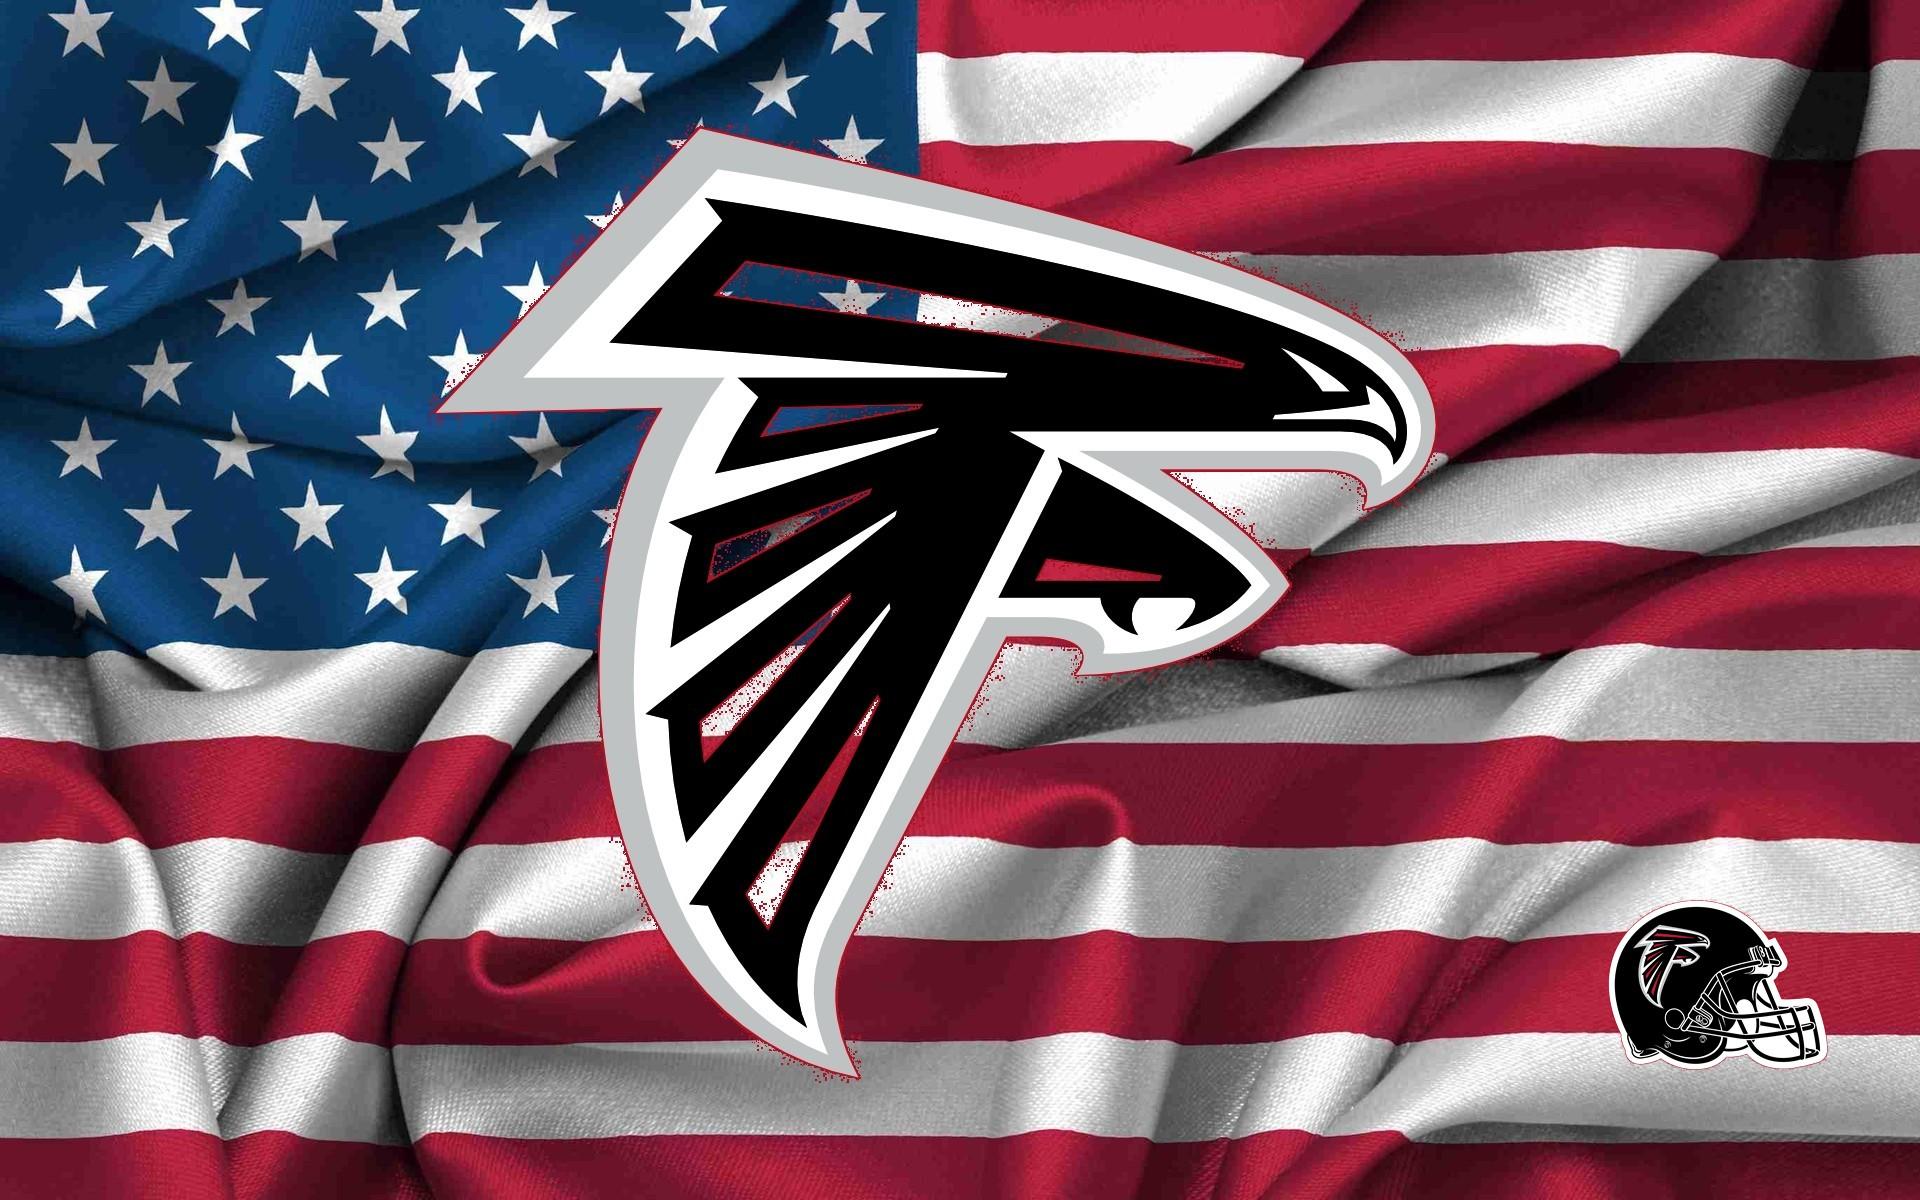 Atlanta Falcons Logo On USA Flag Wavy Canvas 1920x1200 WIDE NFL 1920x1200